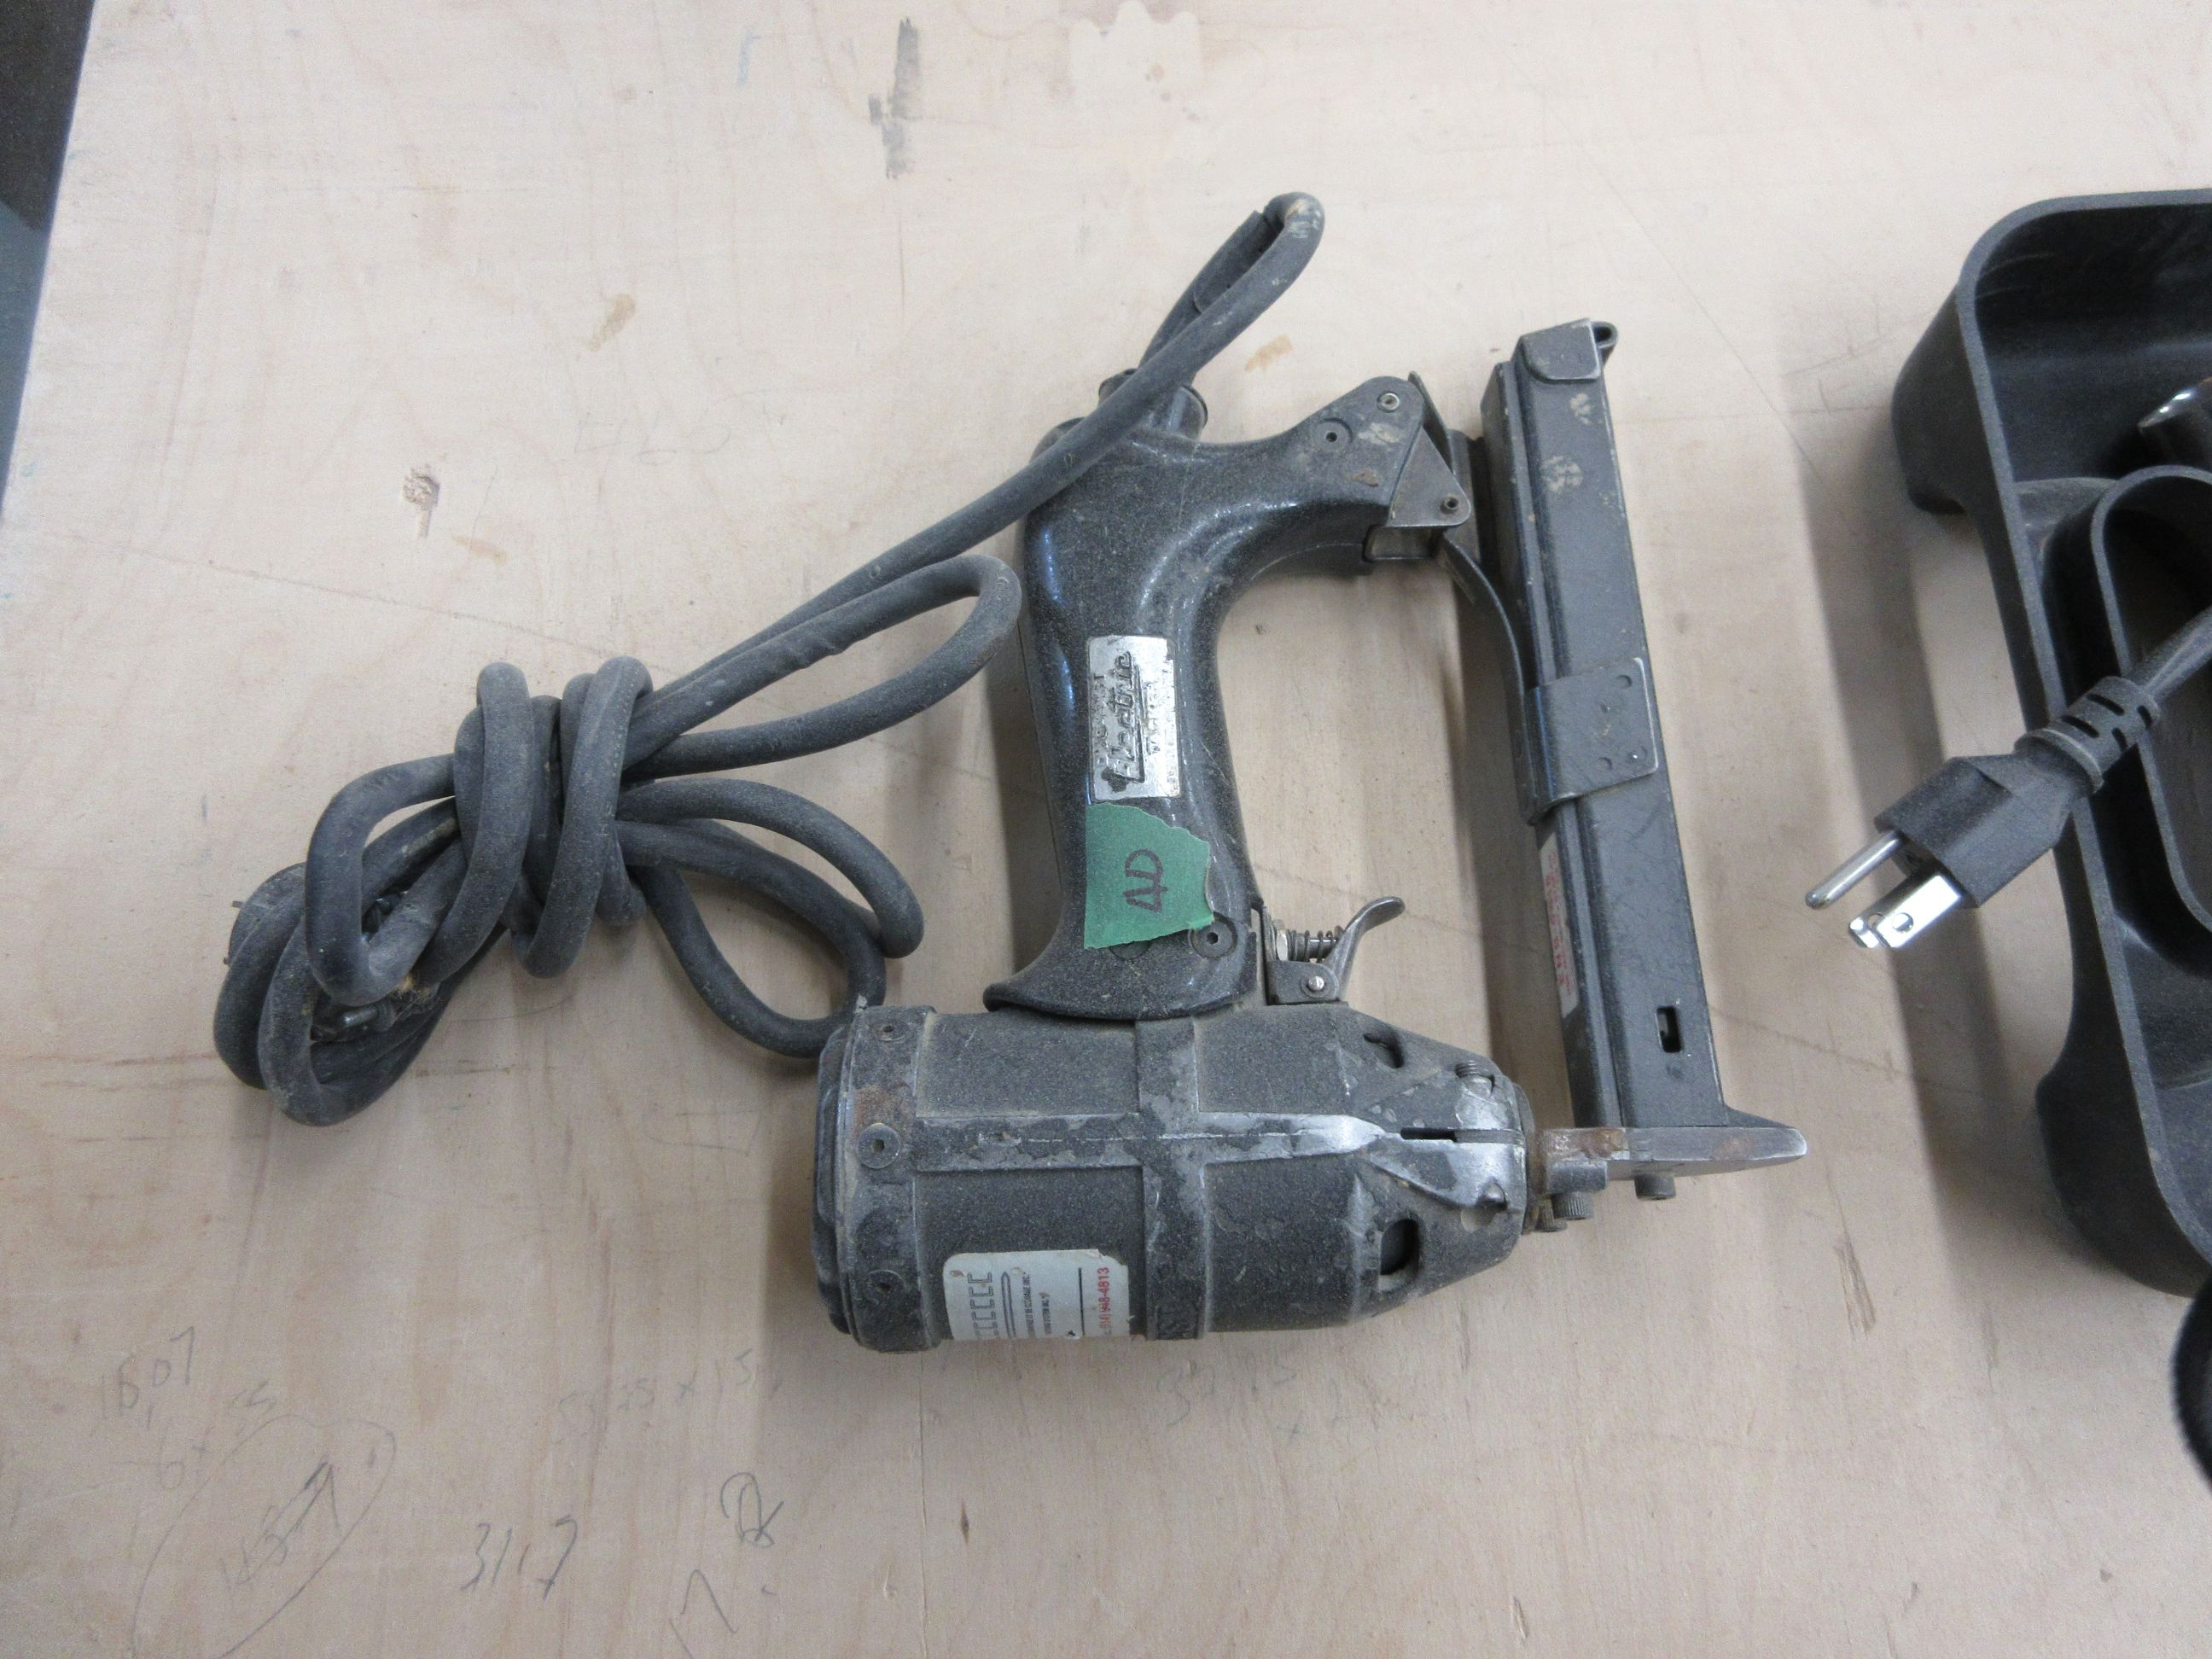 LOT including heater, stapler, etc. - Image 4 of 4